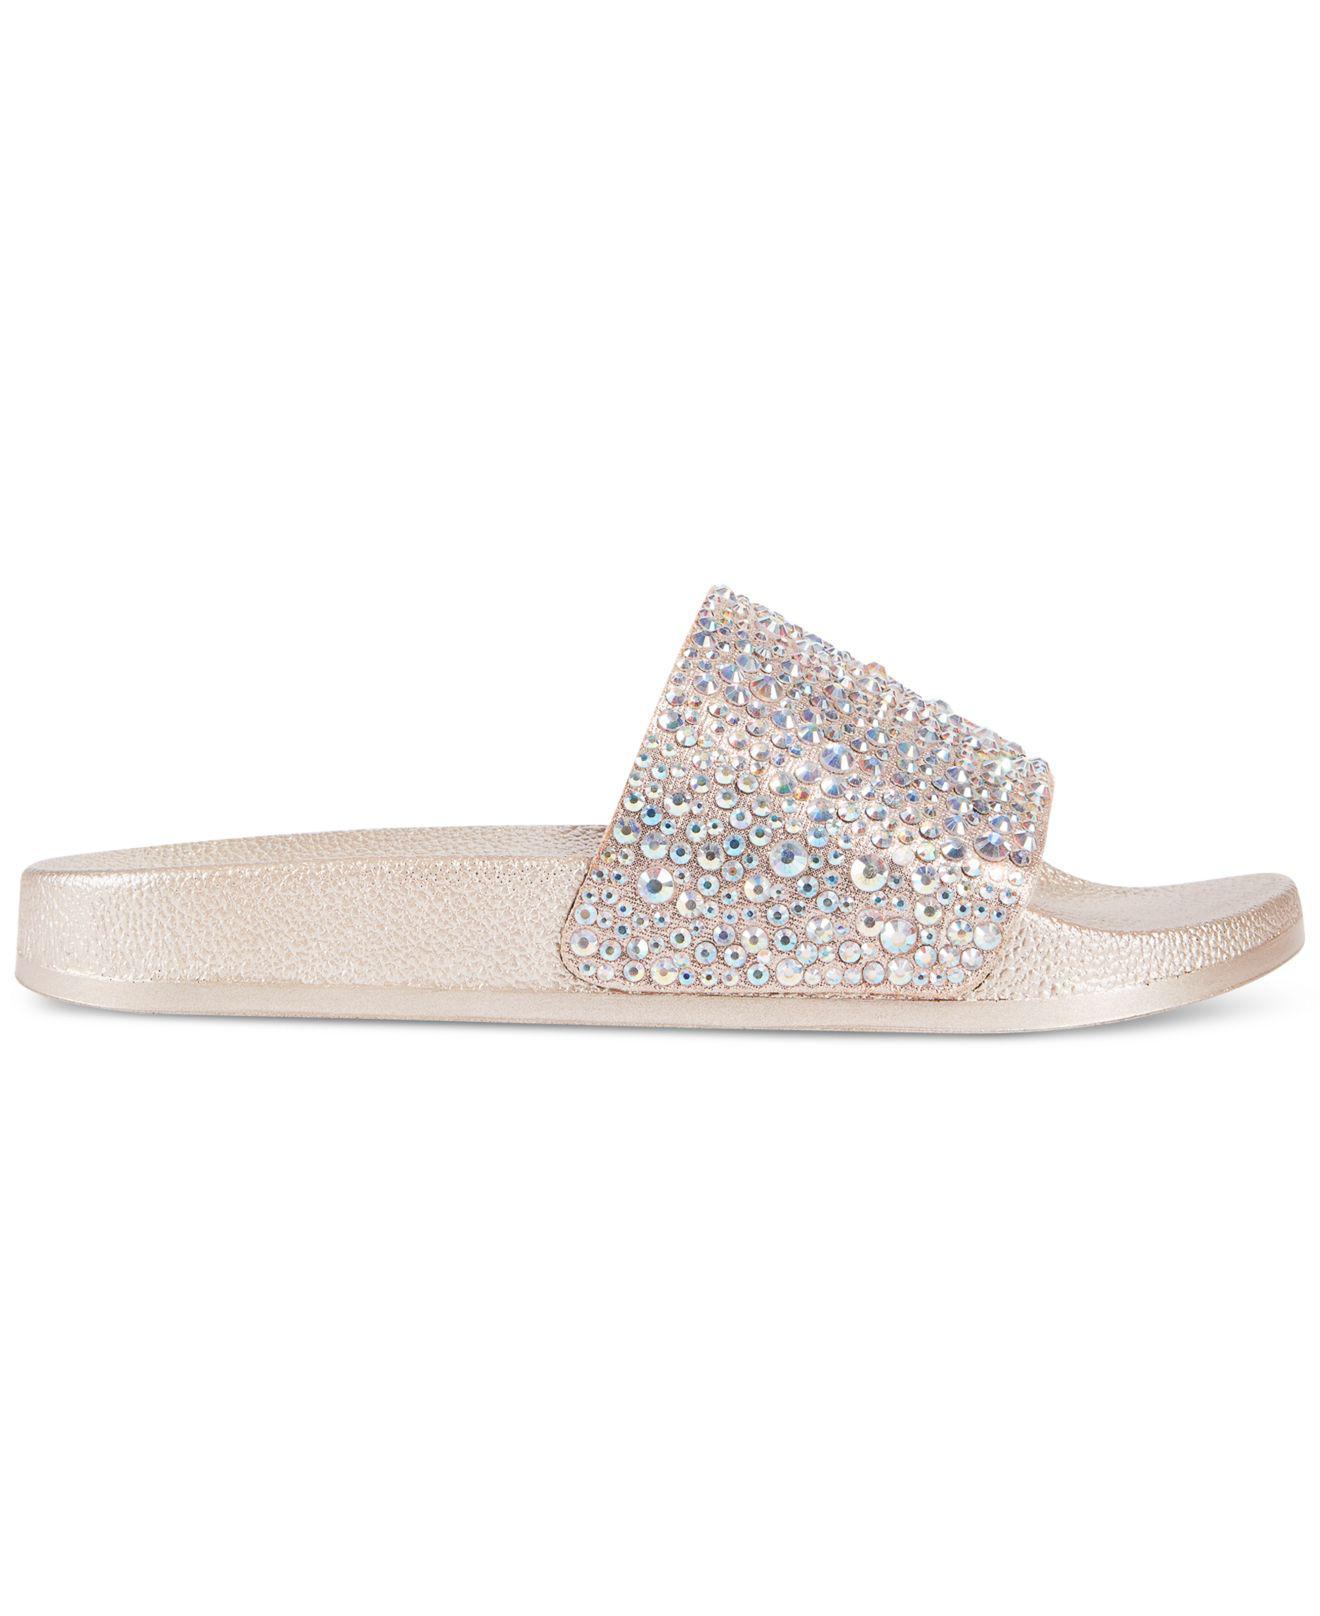 ce47caec8be5d5 Lyst - INC International Concepts Women s Peymin Flat Slide Sandals